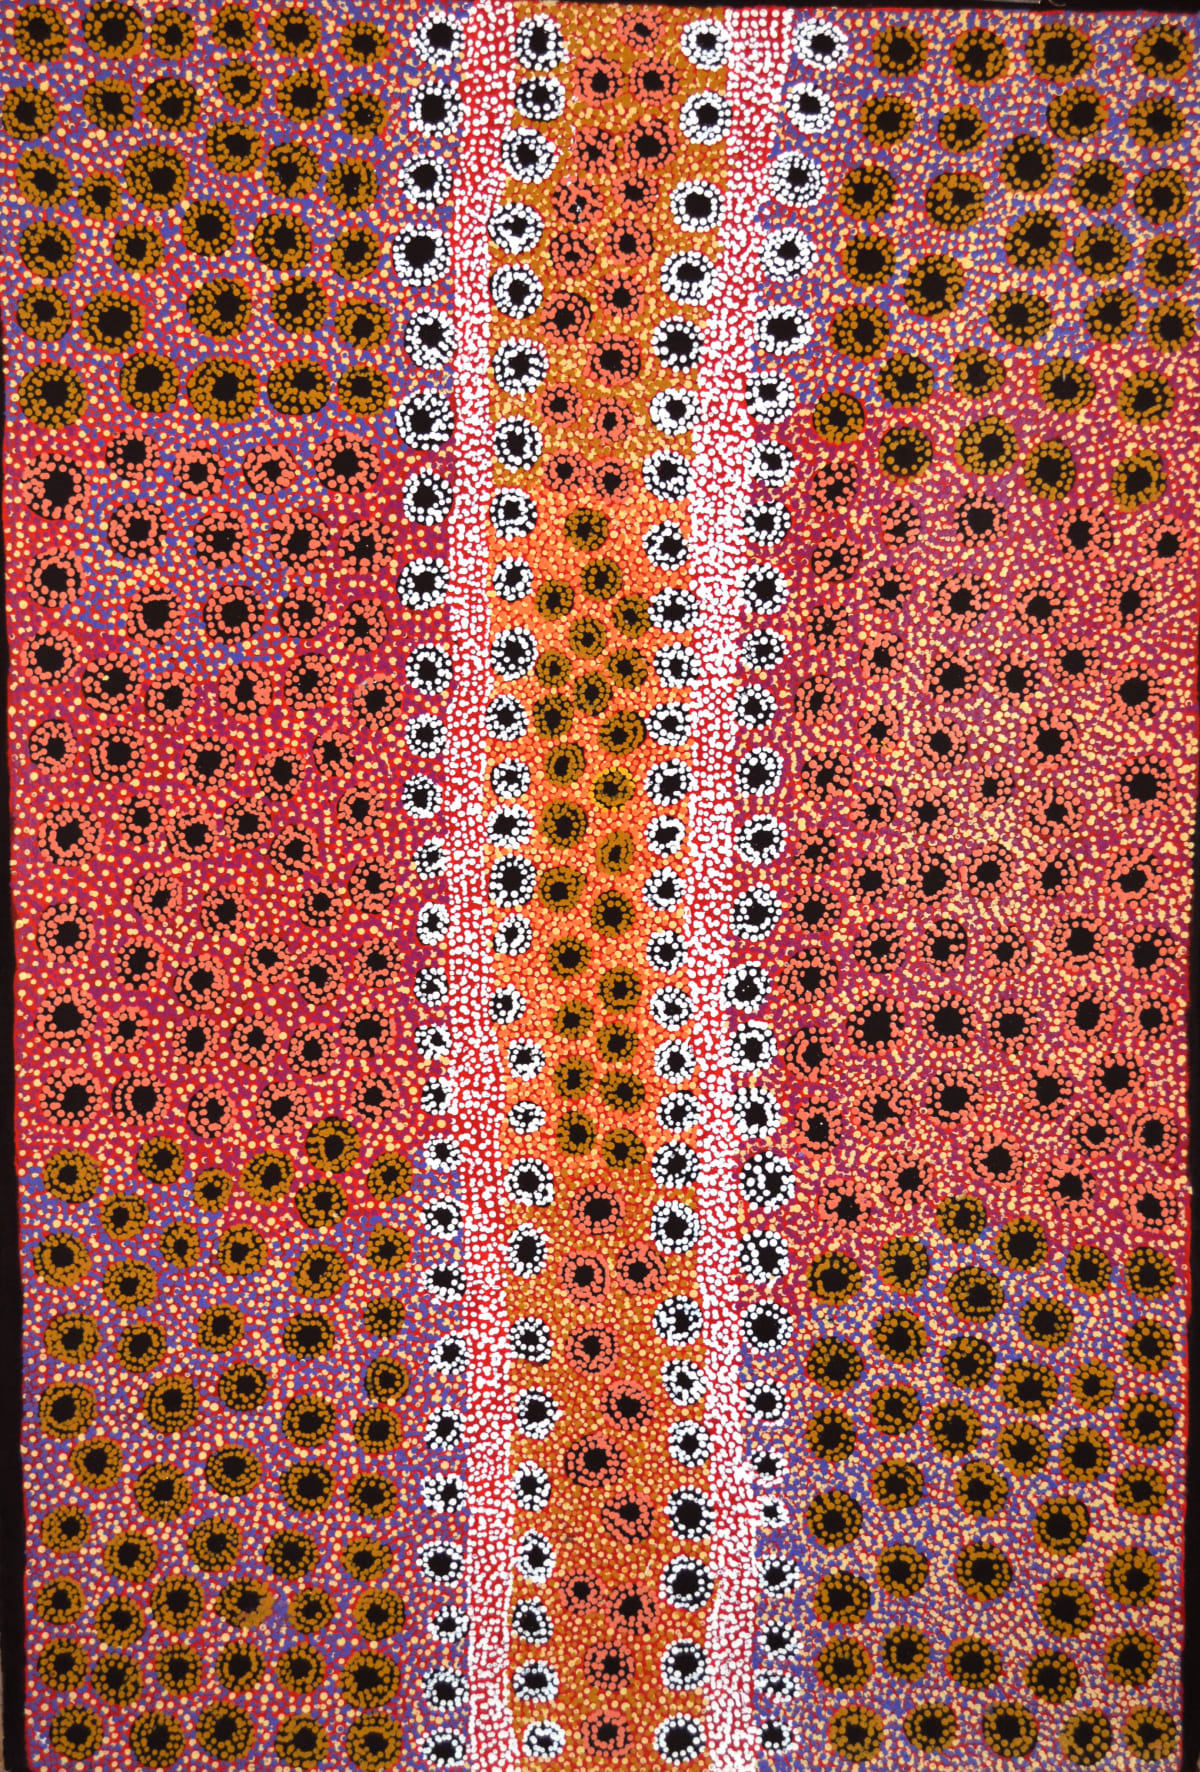 Tjimpayi Presley Seven Sisters 2014 acrylic on linen 152.5 x 101.5 cm